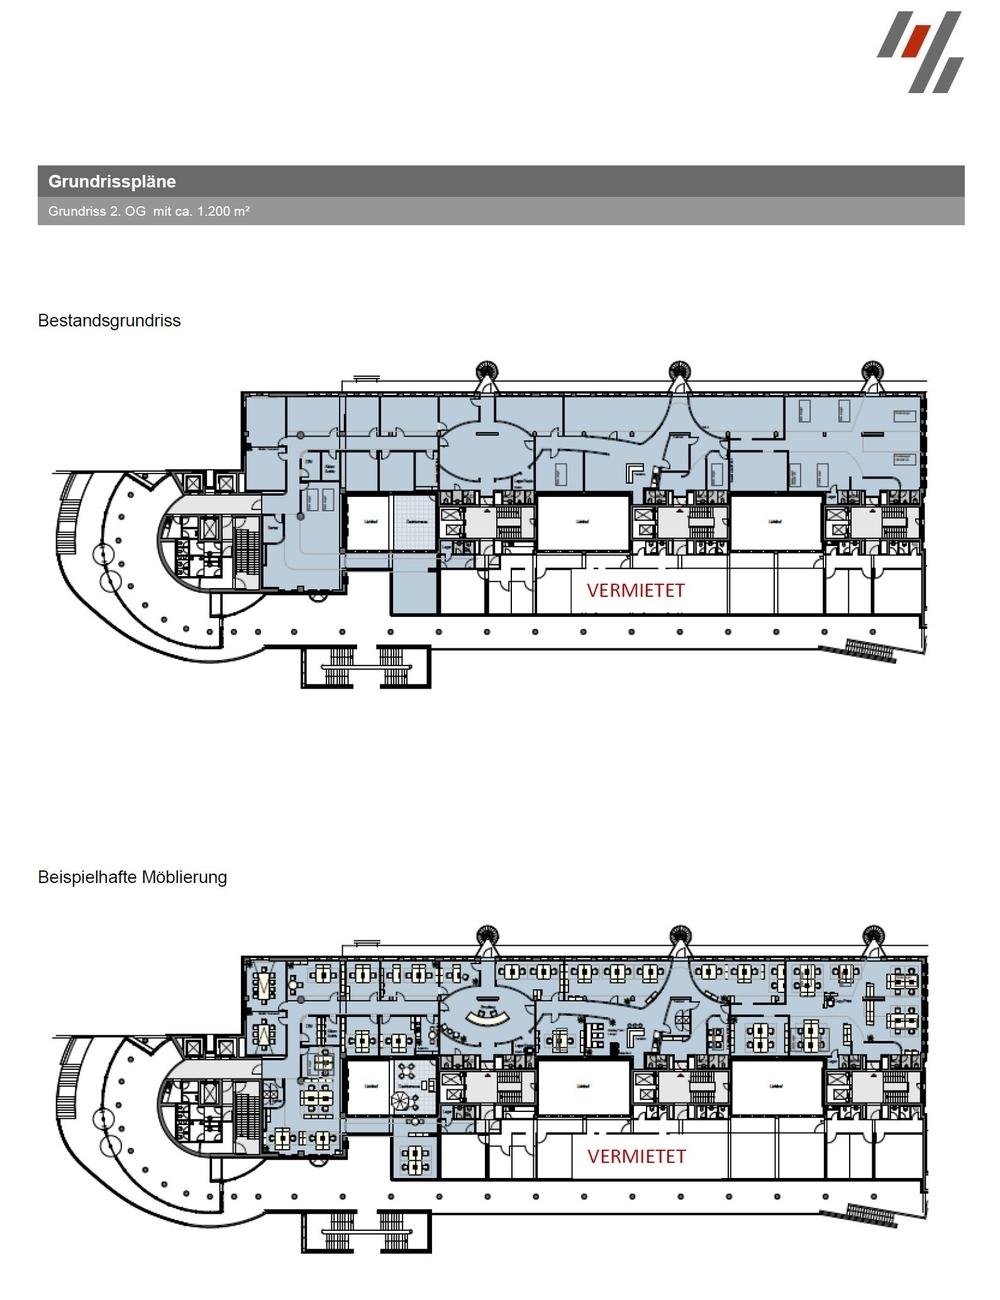 Grundriss Columbus Haus 2. OG (ca. 1200 m²)